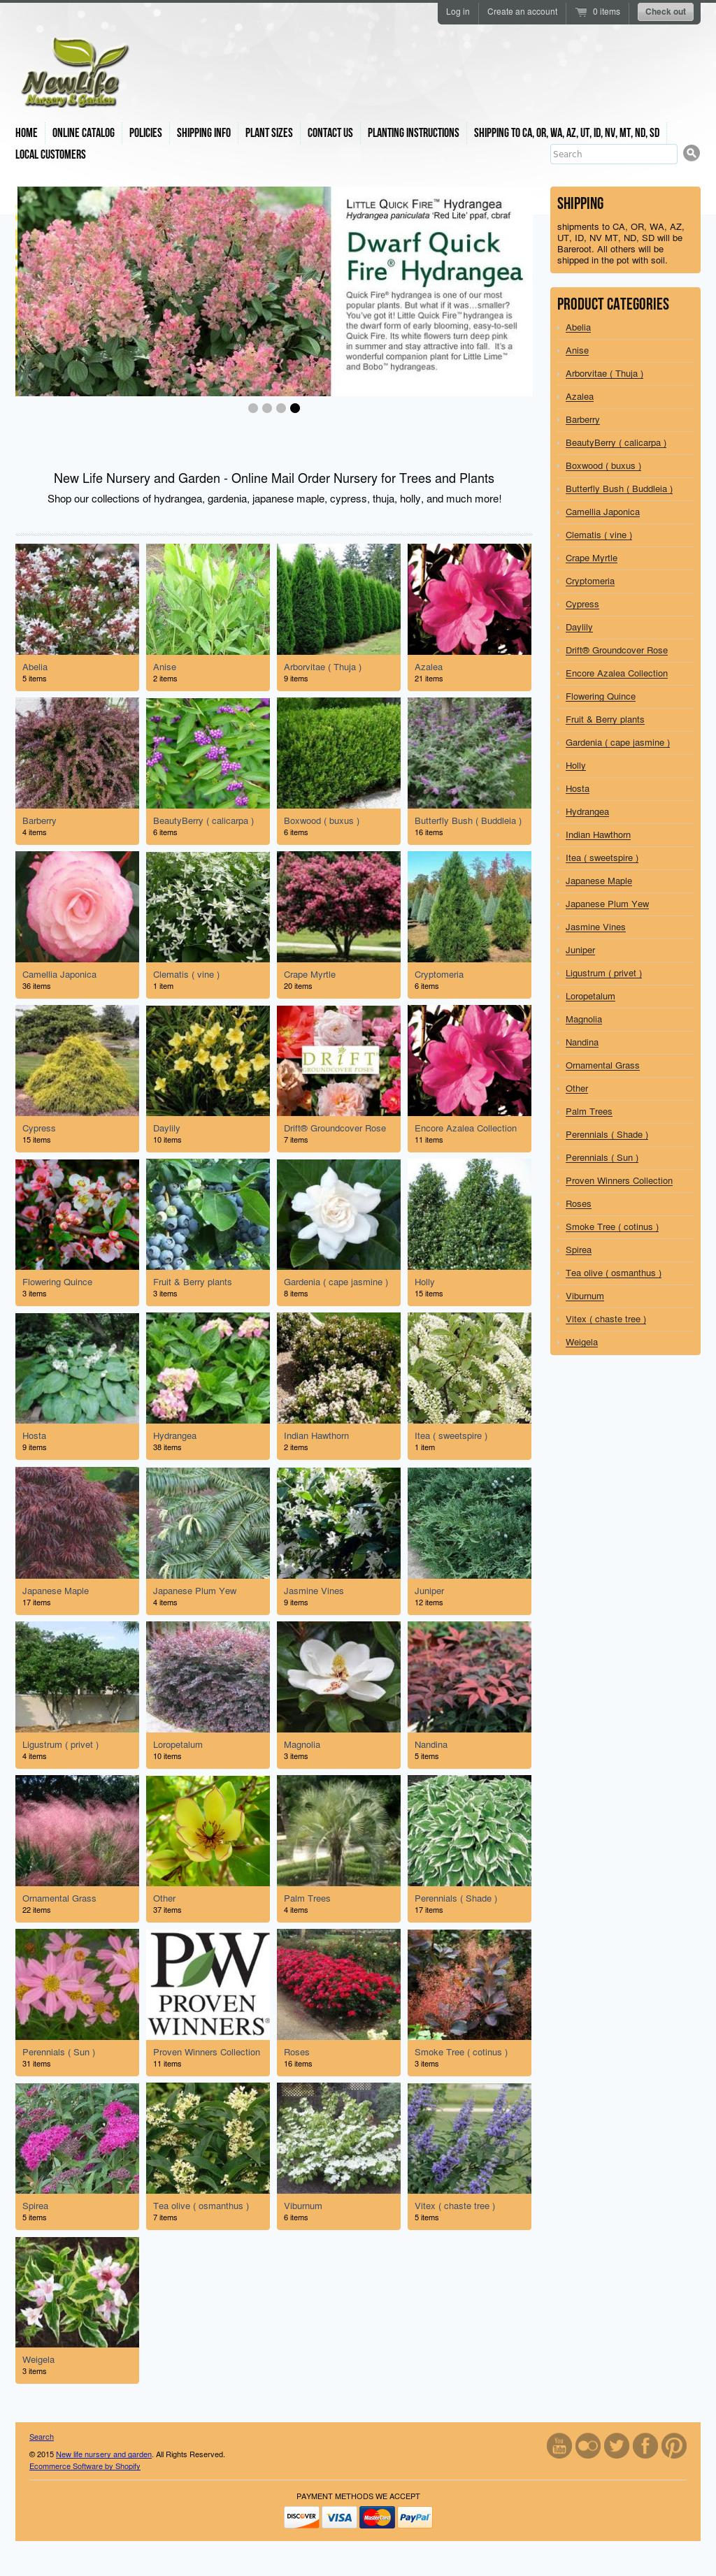 New Life Nursery And Garden Compeors Revenue